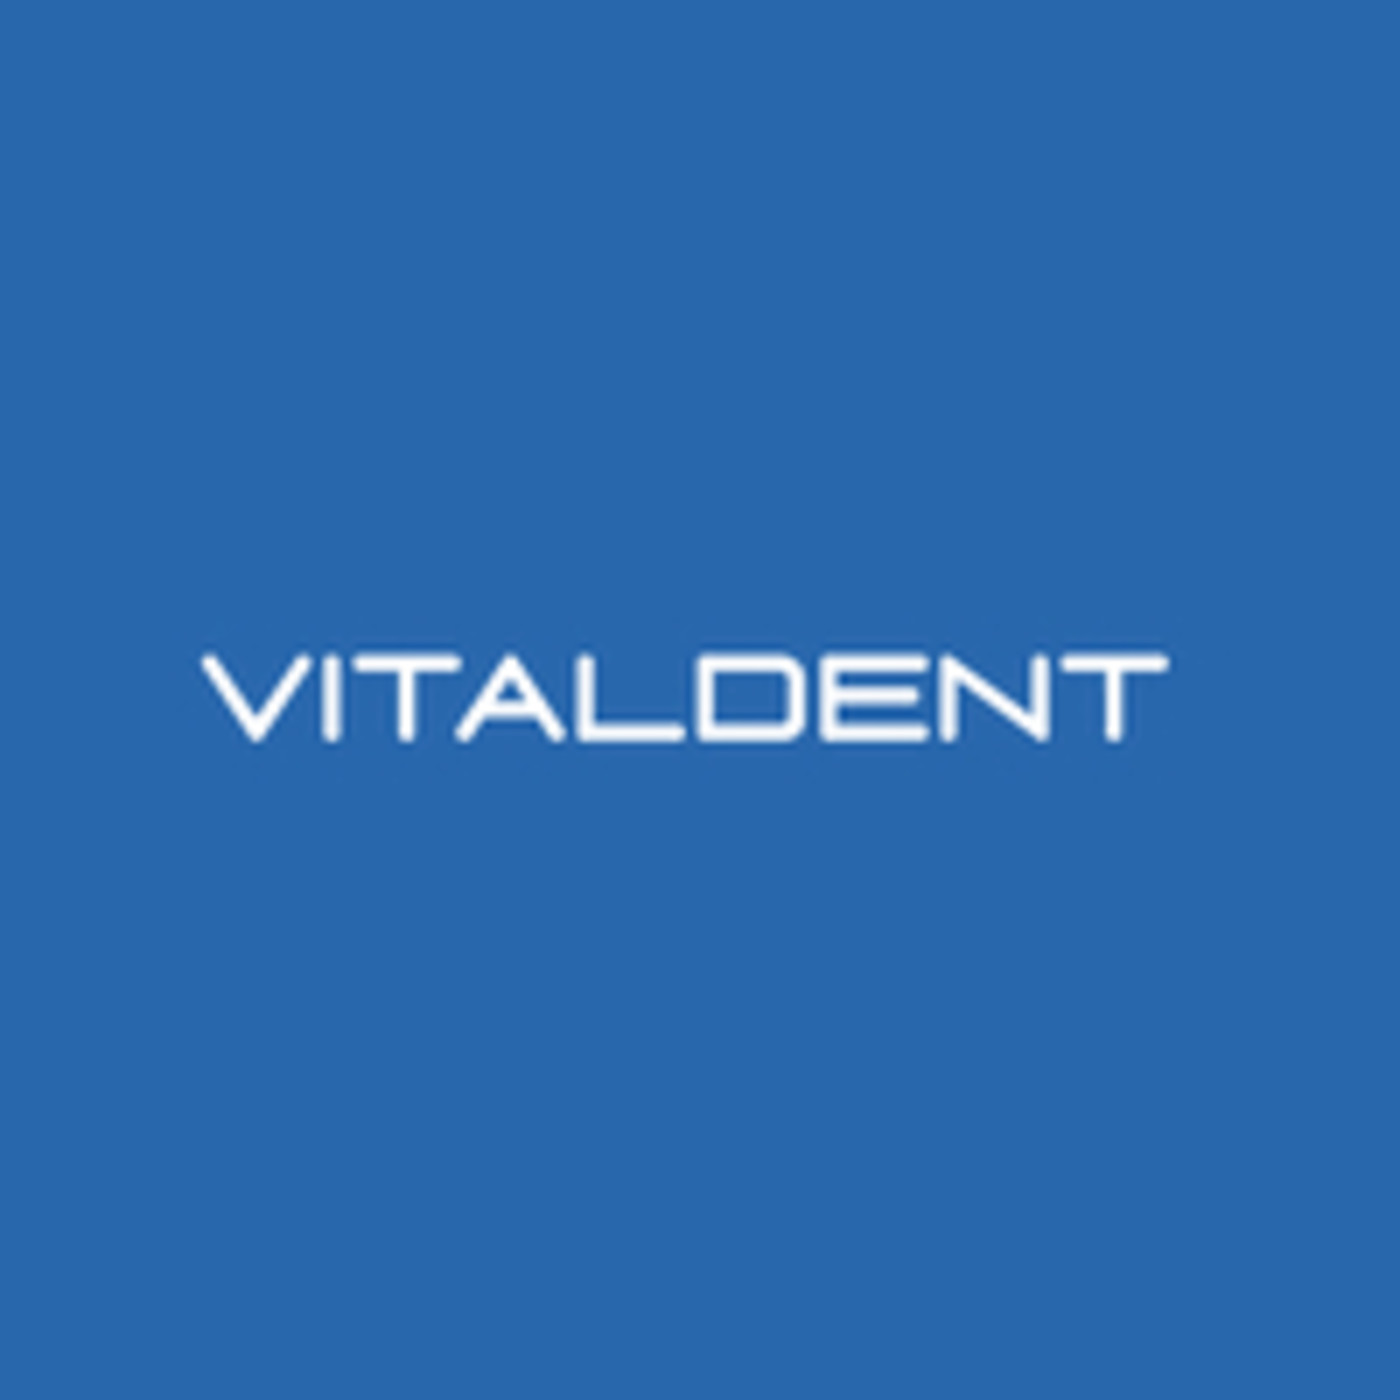 Vitaldent: Los higienistas dentales